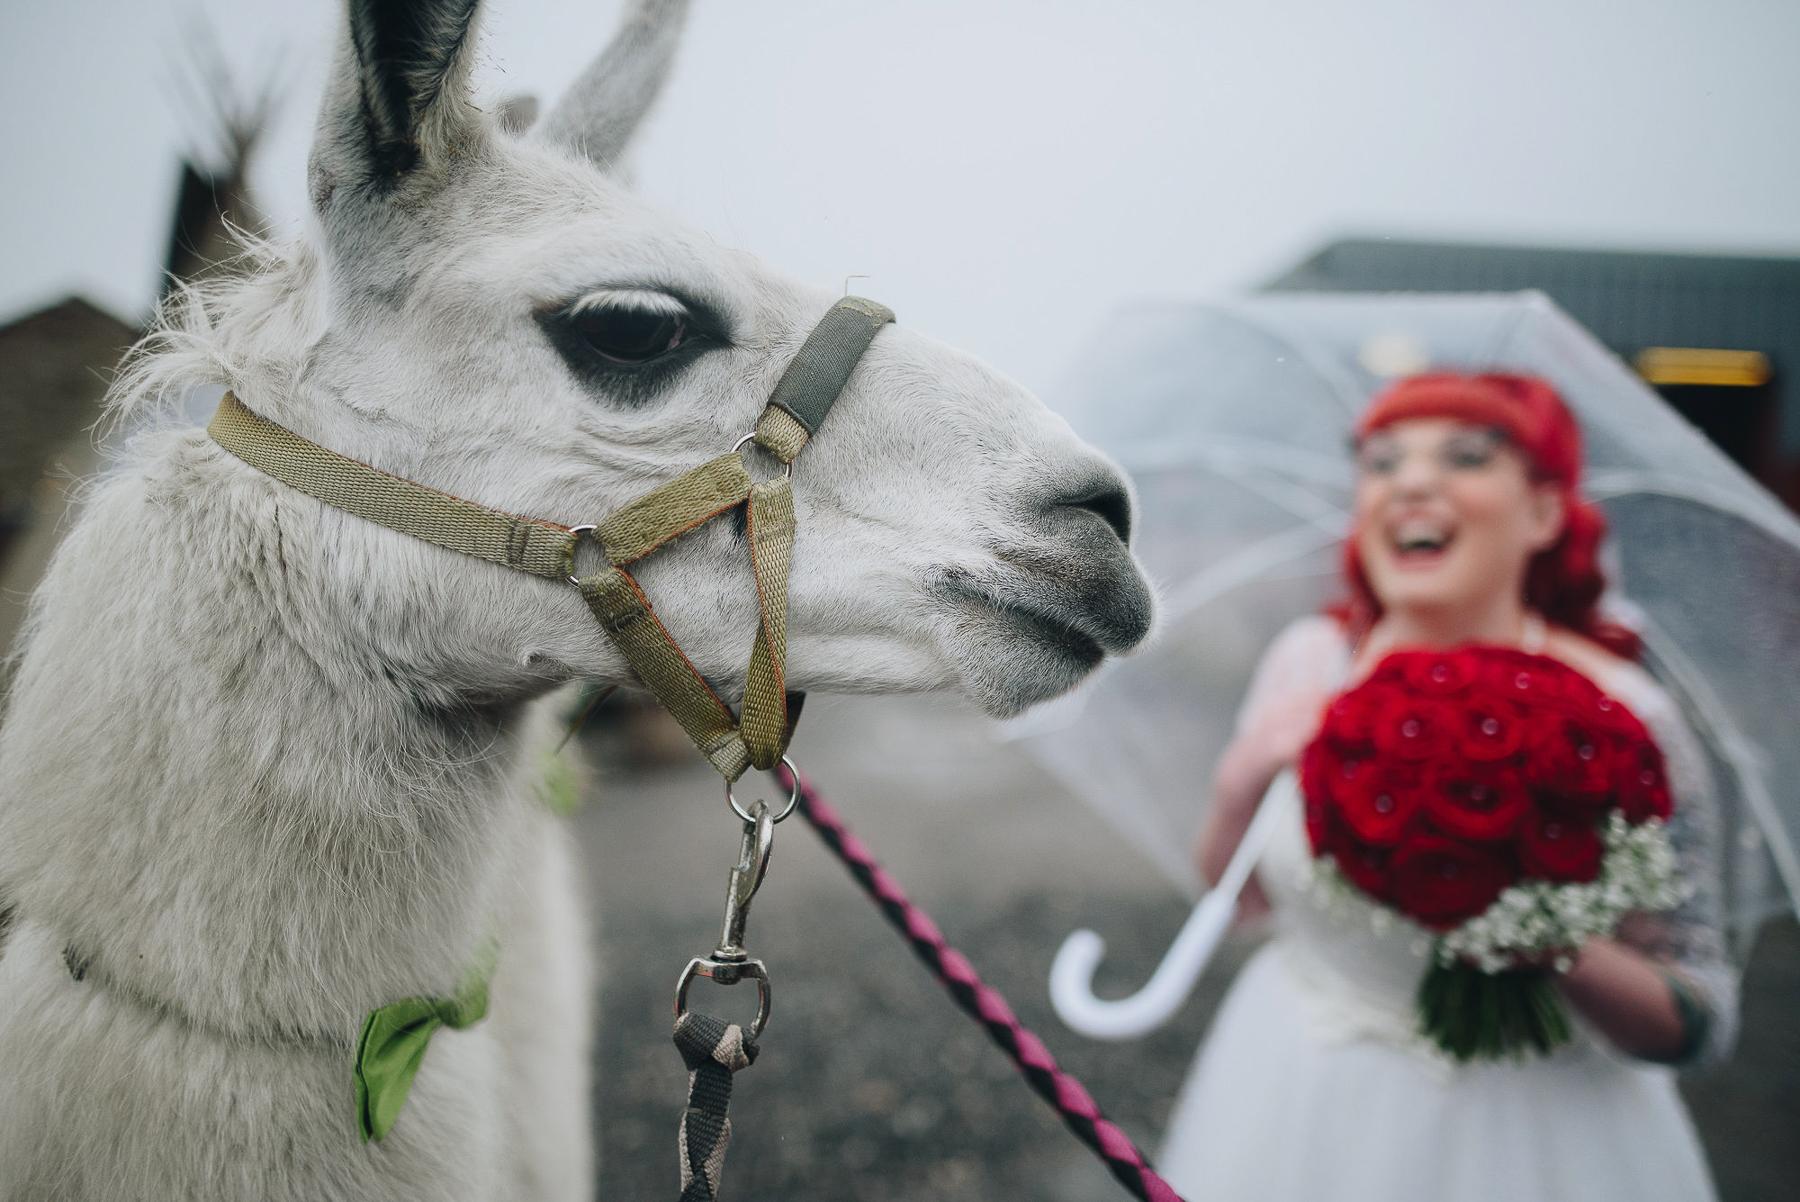 Wellbeing_Farm_Wedding_Photography_The_Pin-Up_Bride_Lara_Shaun-78.jpg